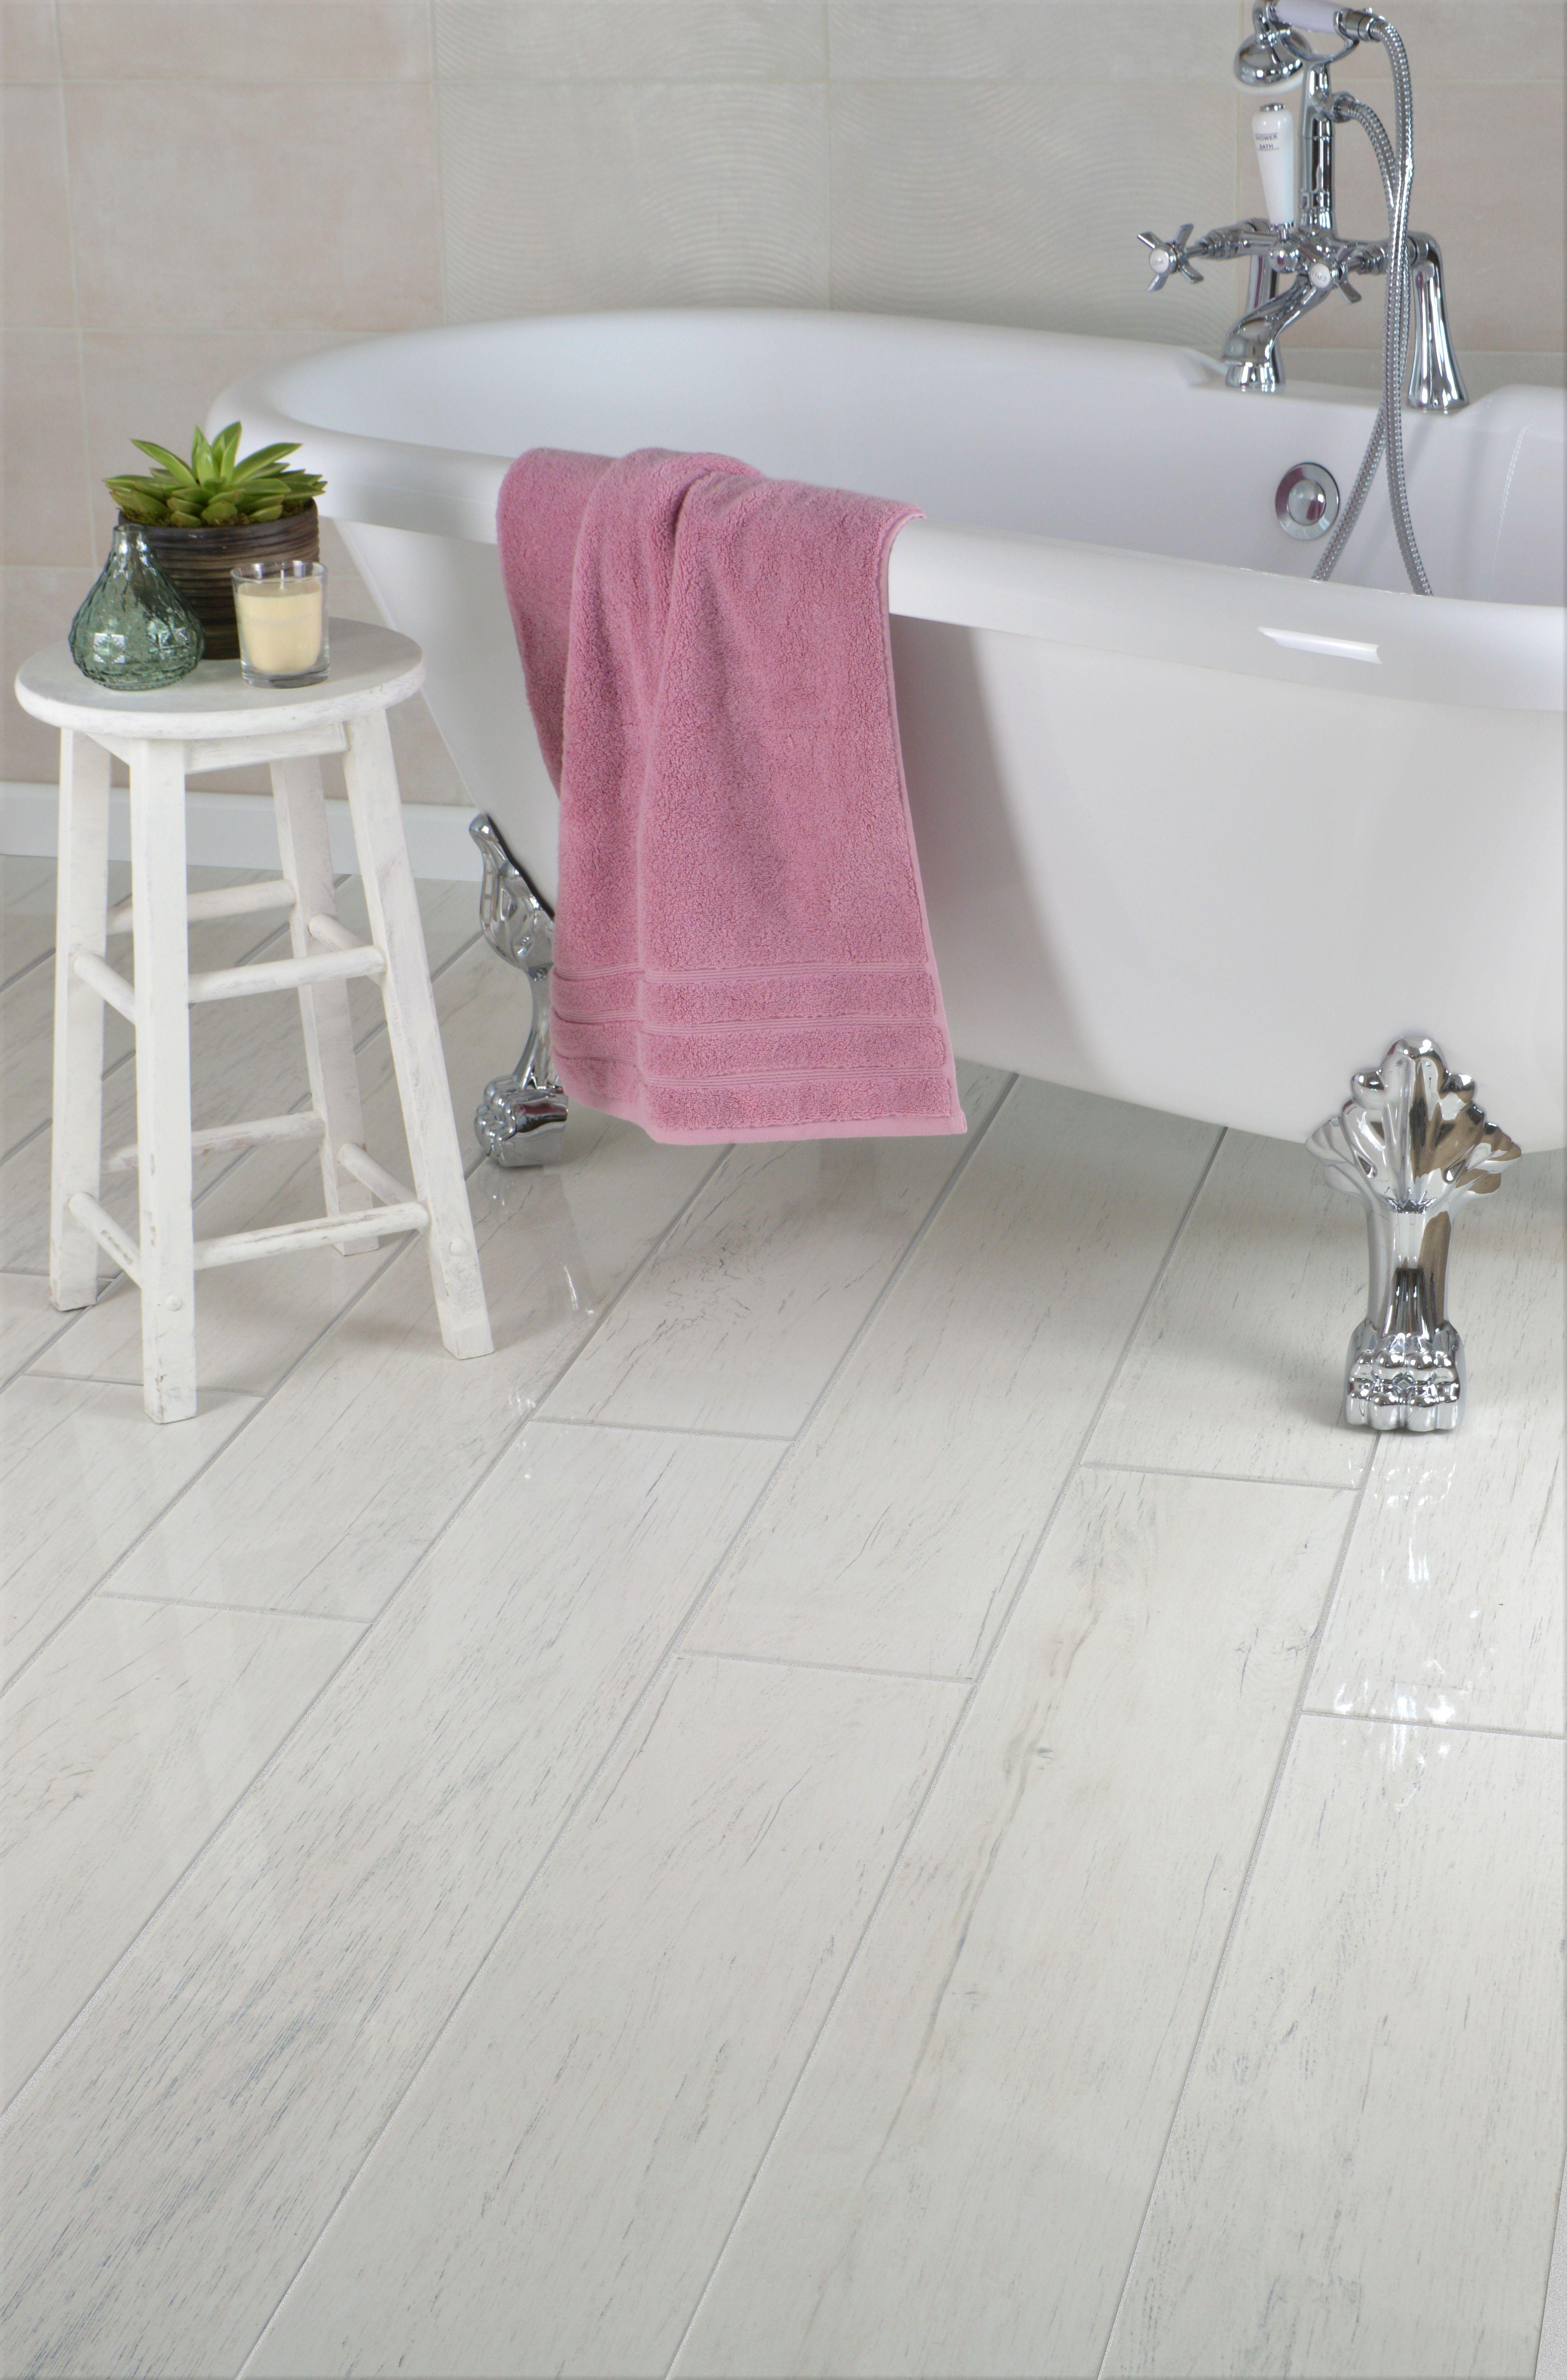 Sevenoaks White Oak Polished Wood Effect Tiles Wood Floor Bathroom Wood Effect Tiles White Wooden Floor